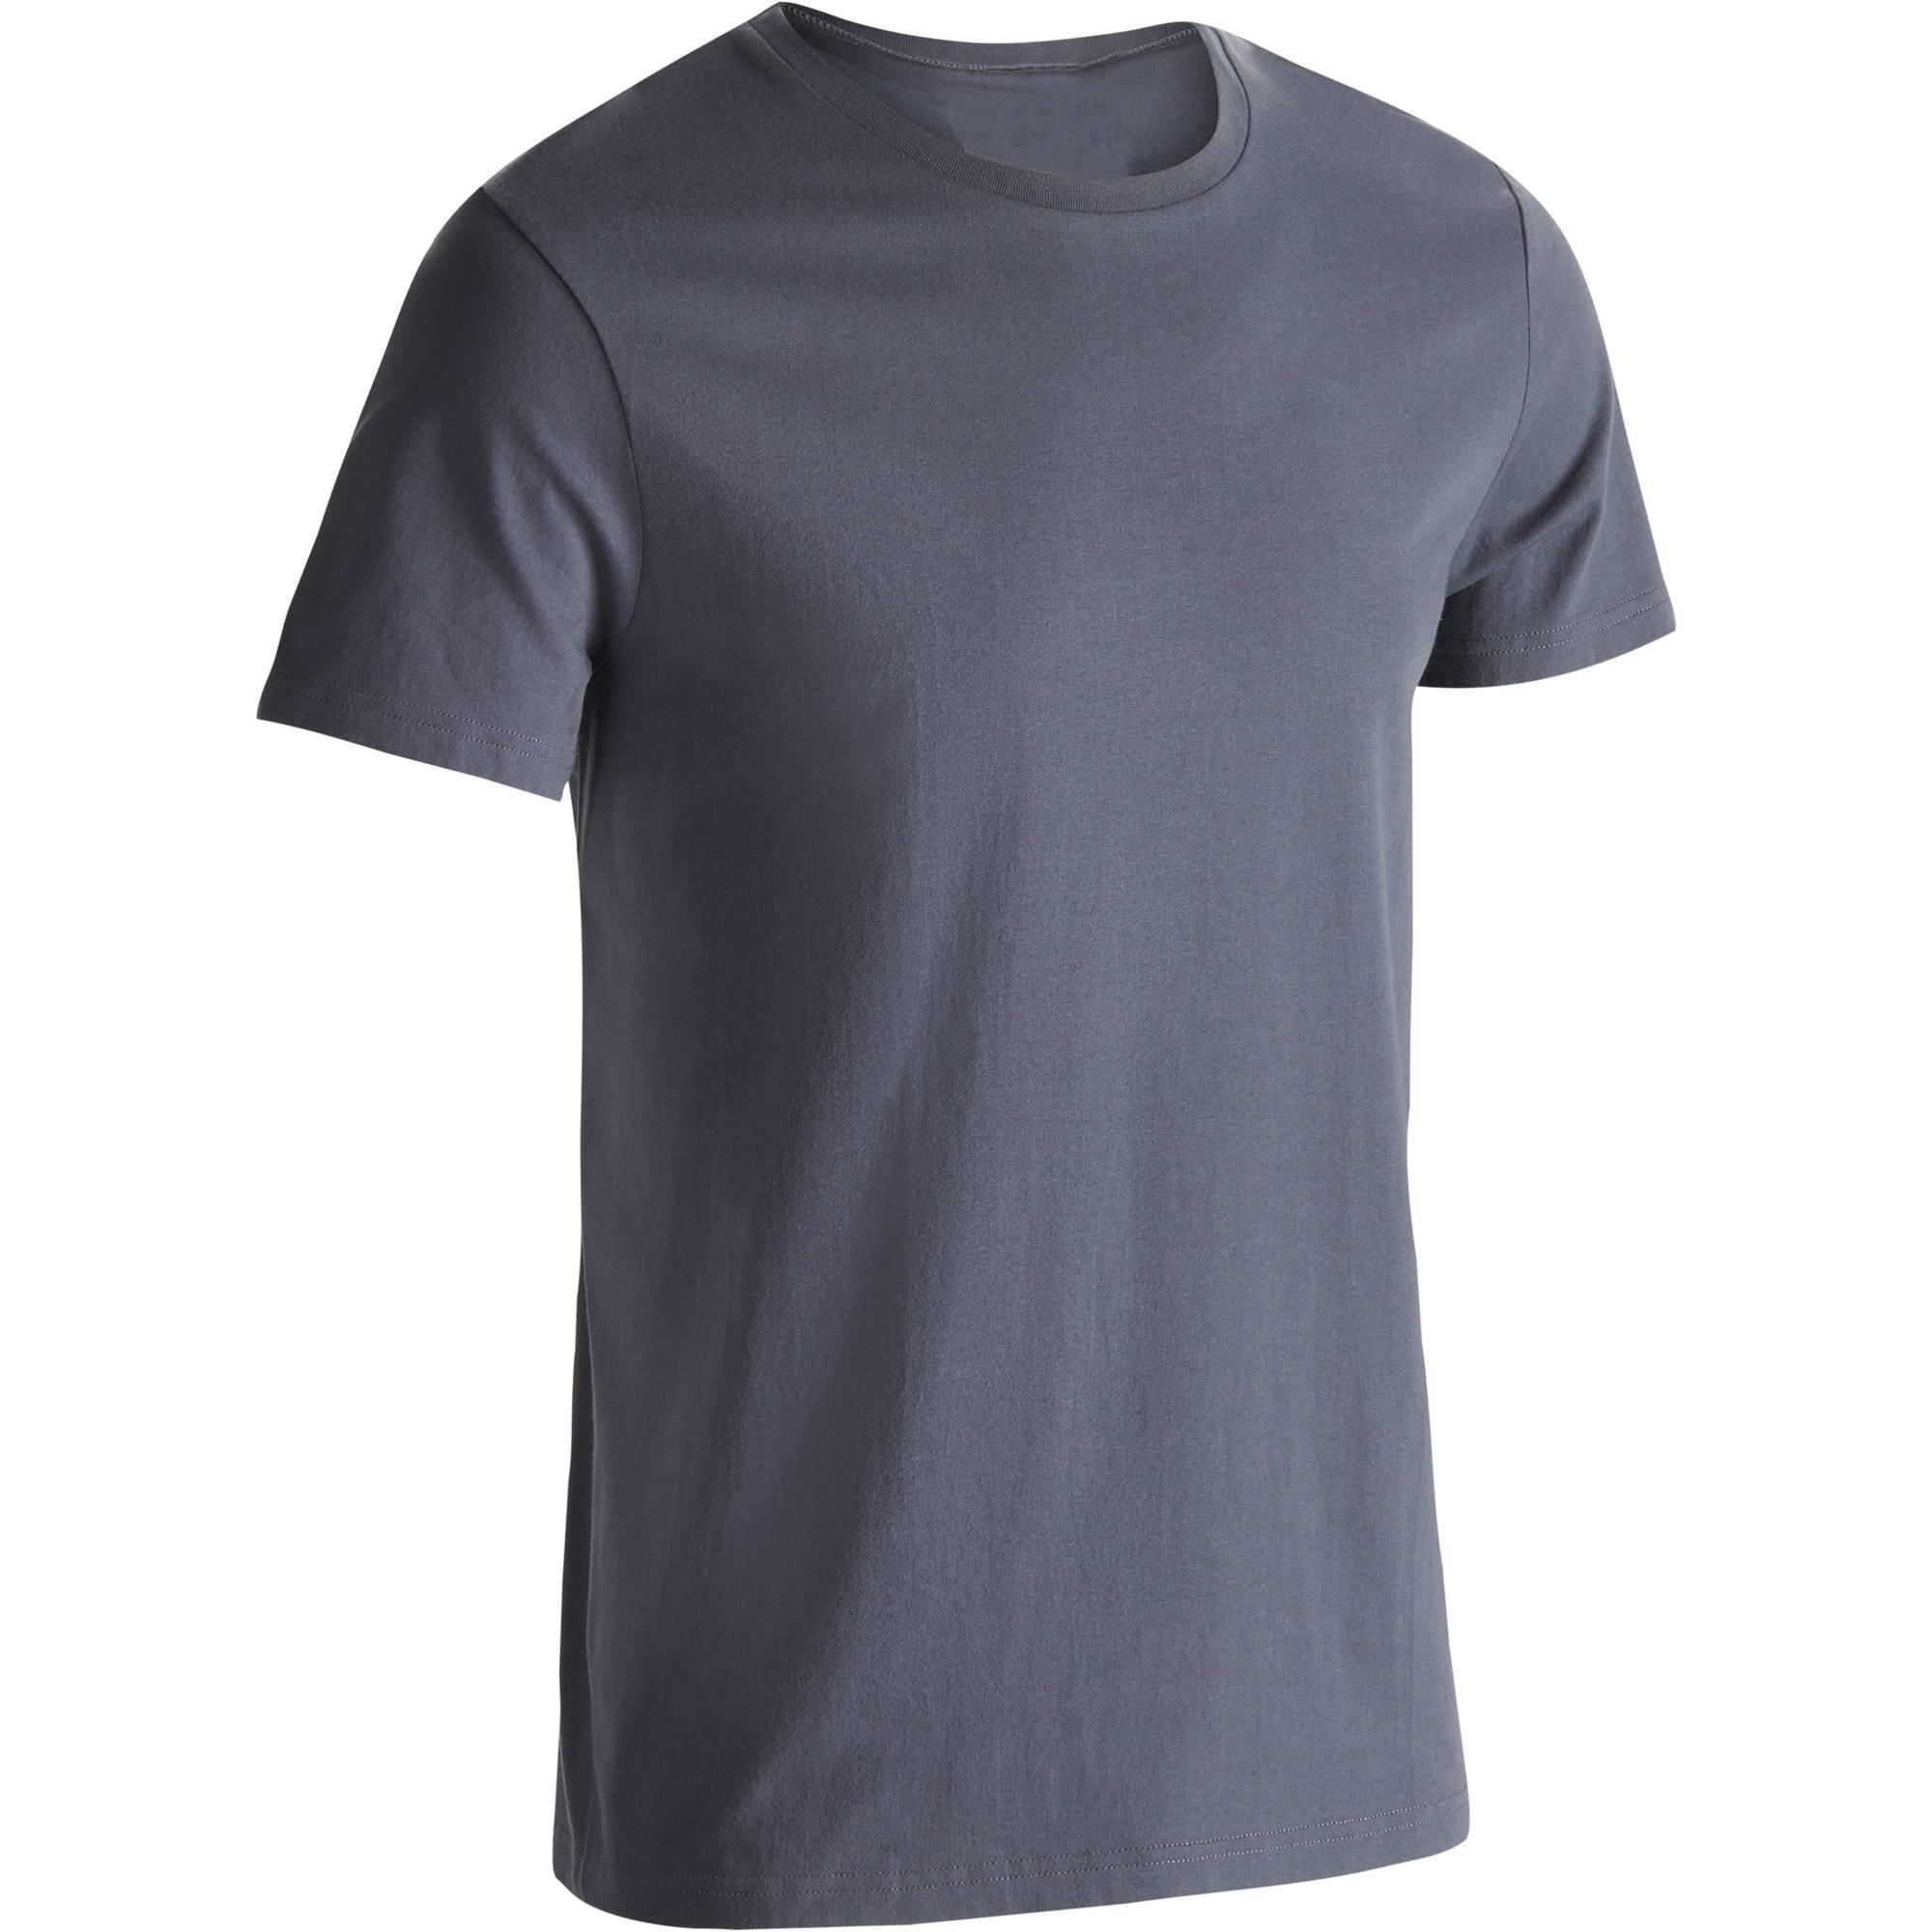 T-Shirt Sportee 100 regular Gym Stretching 100% coton homme gris